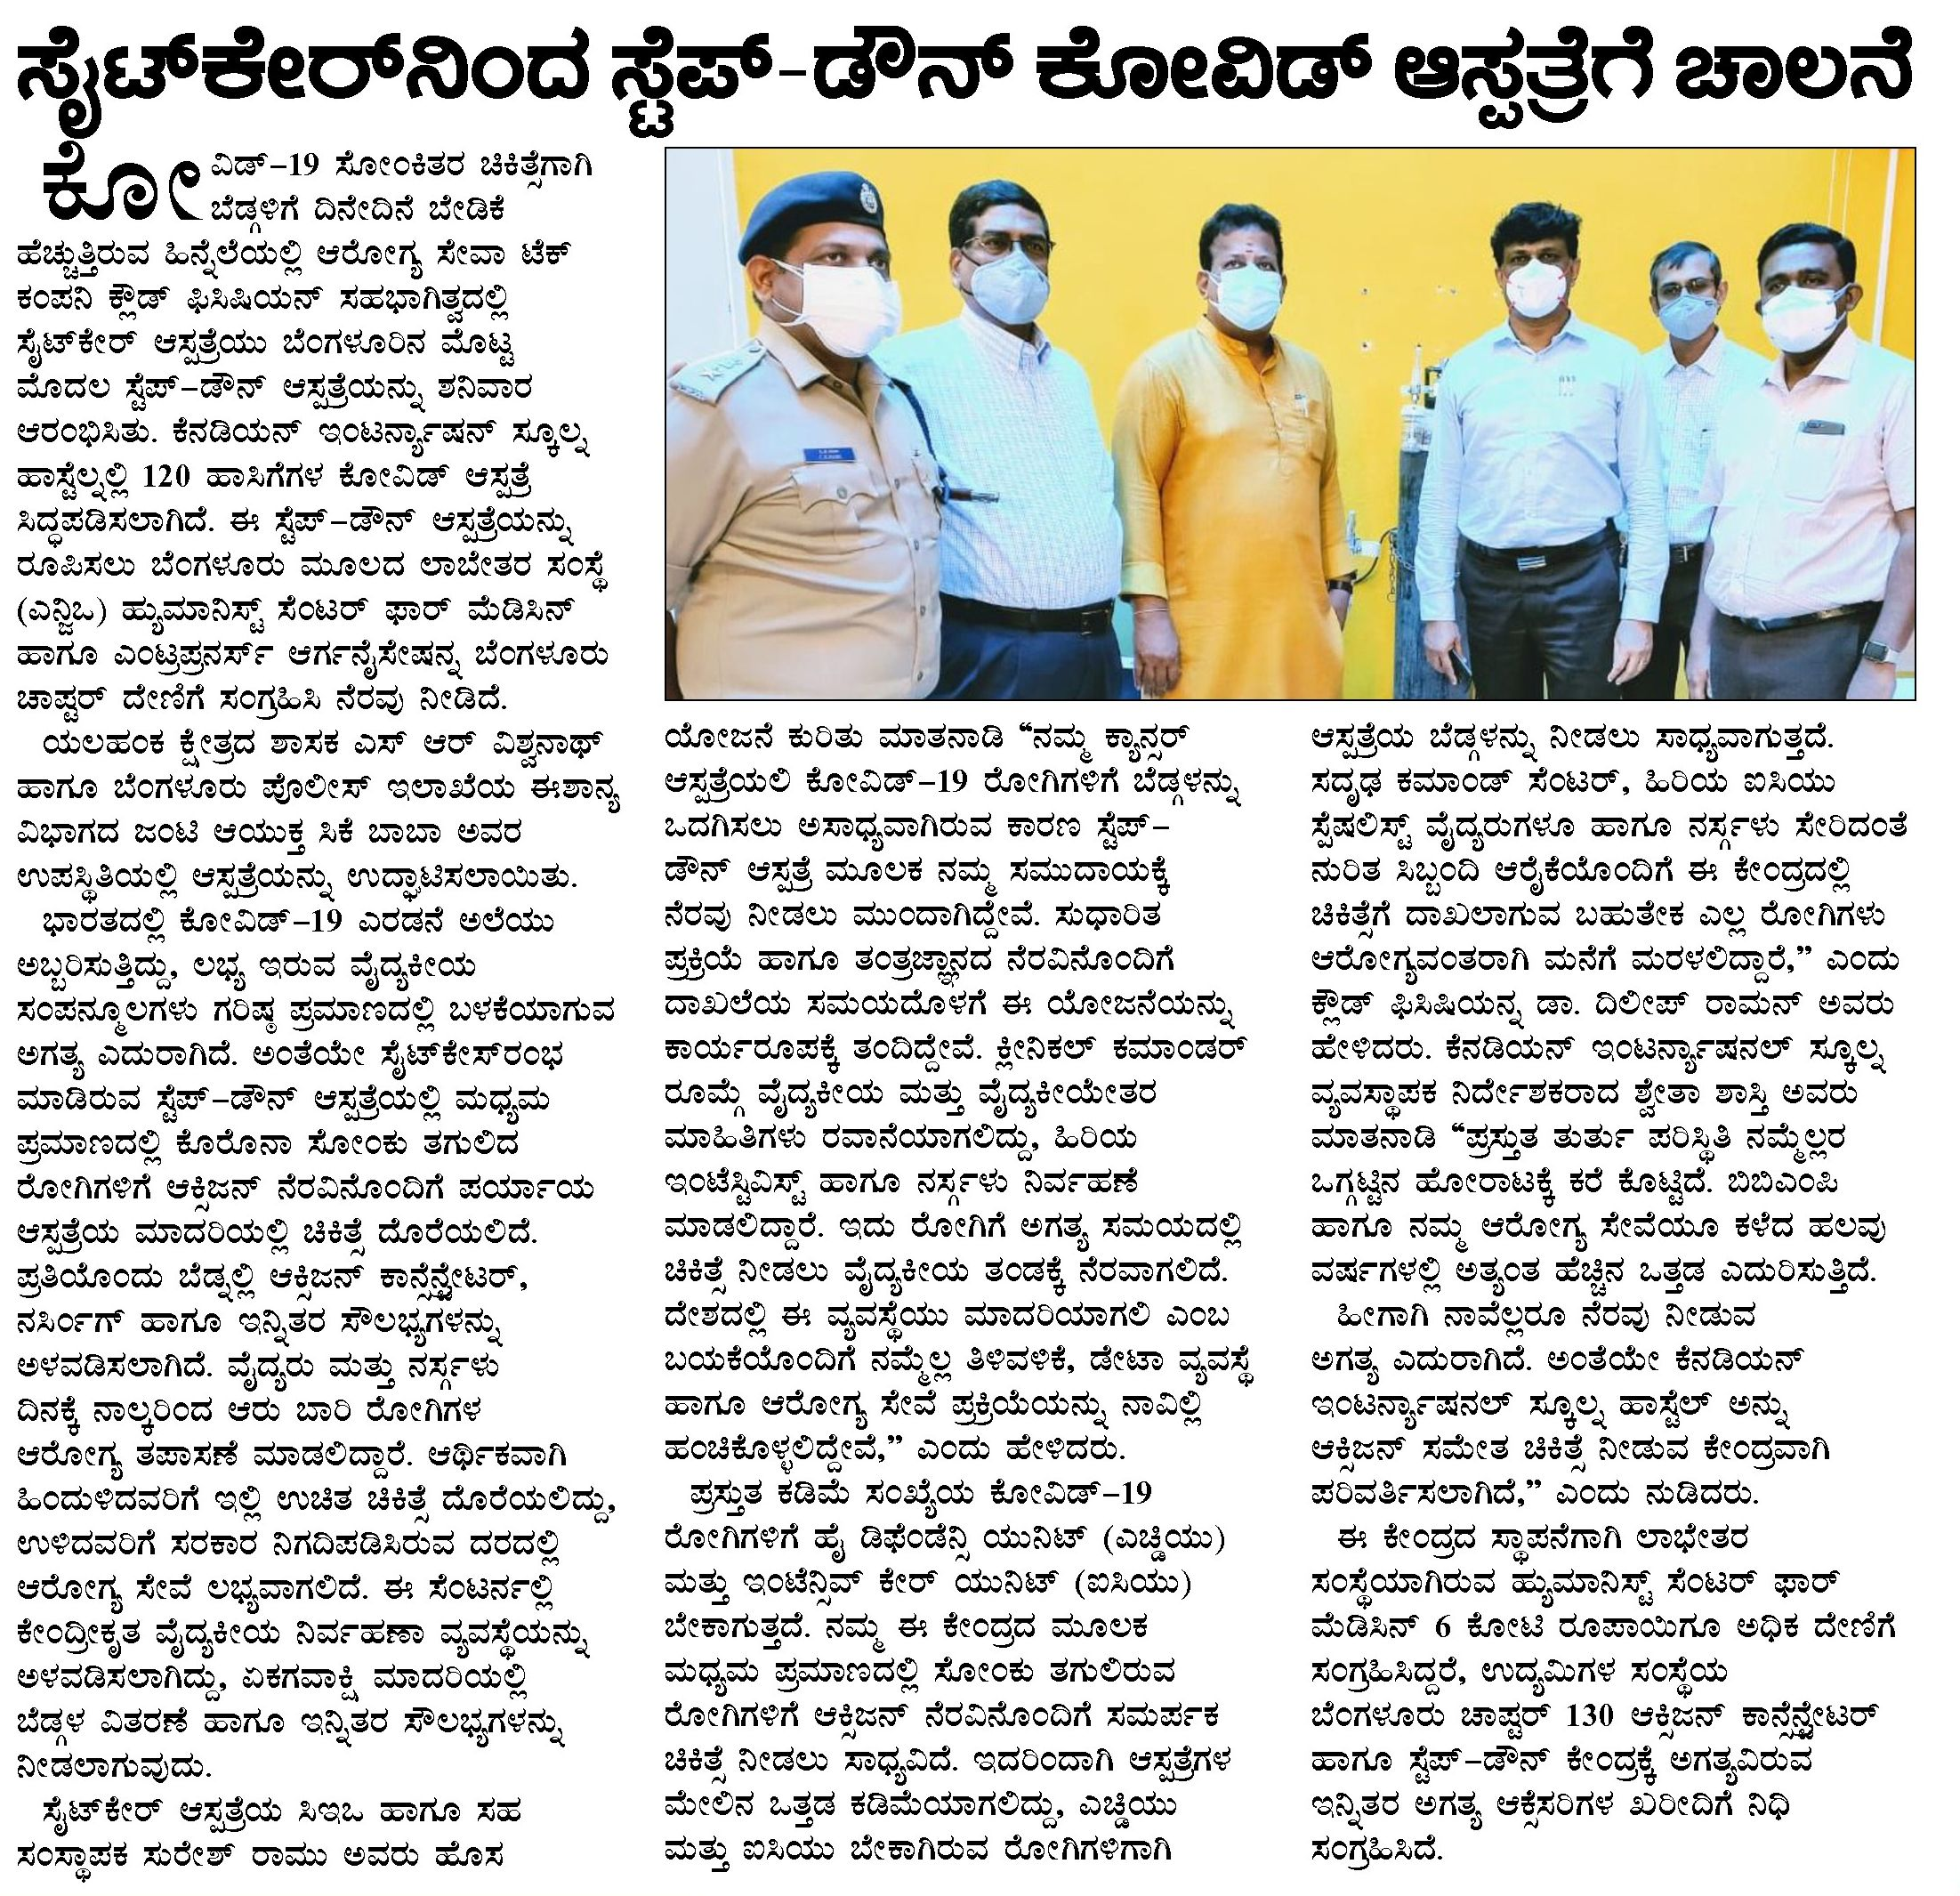 Cytecare launches step-down Covid Hospital -Vishwa Vaaridhi